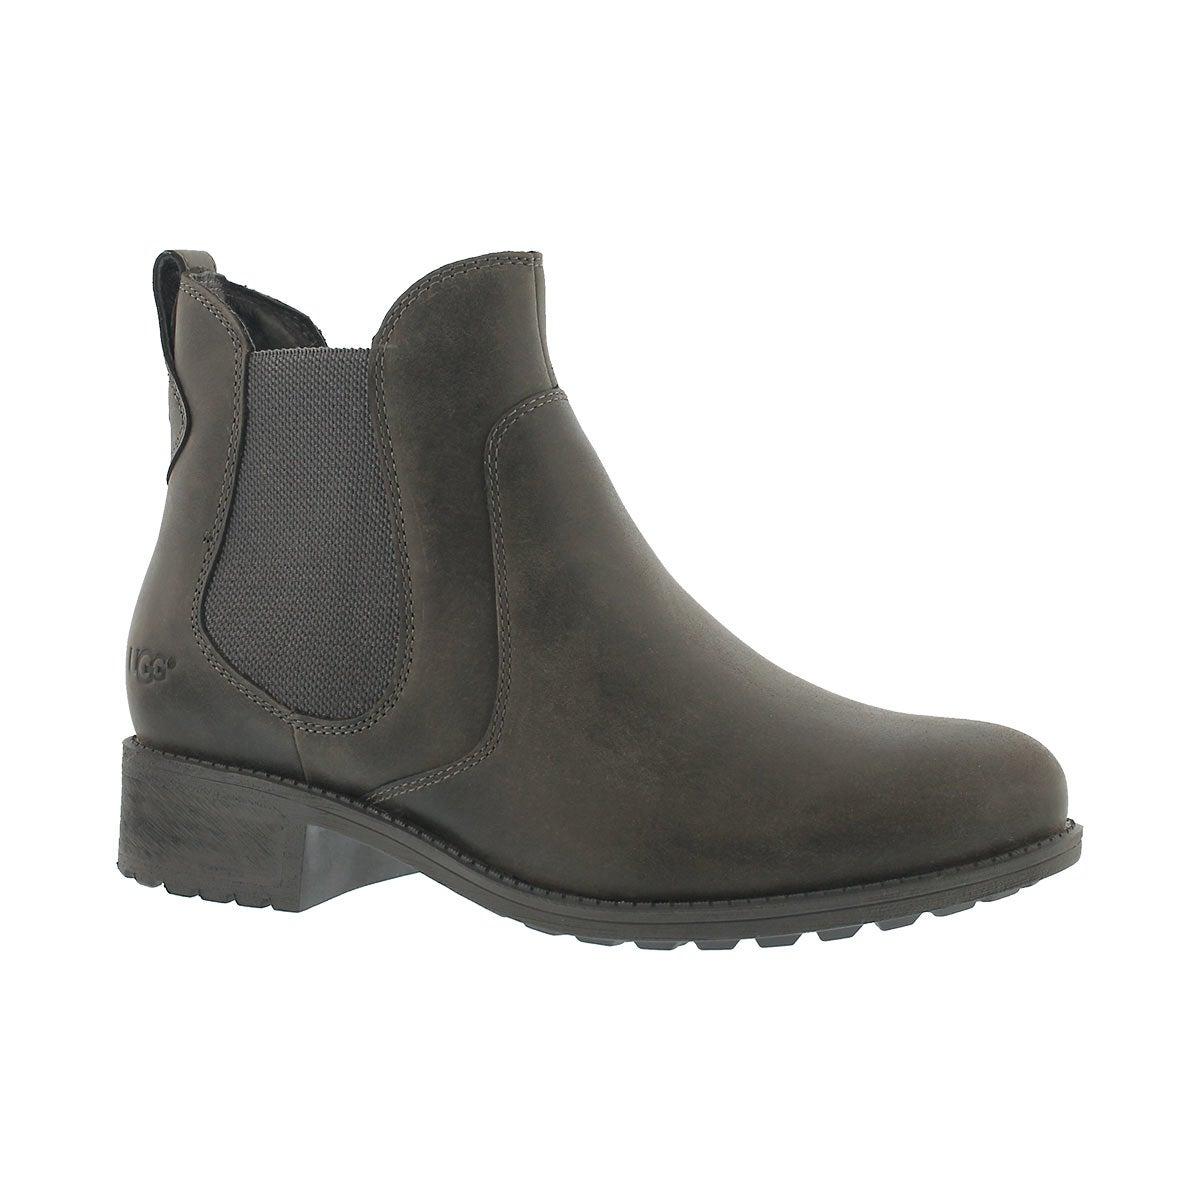 Women's BONHAM grey chelsea boots